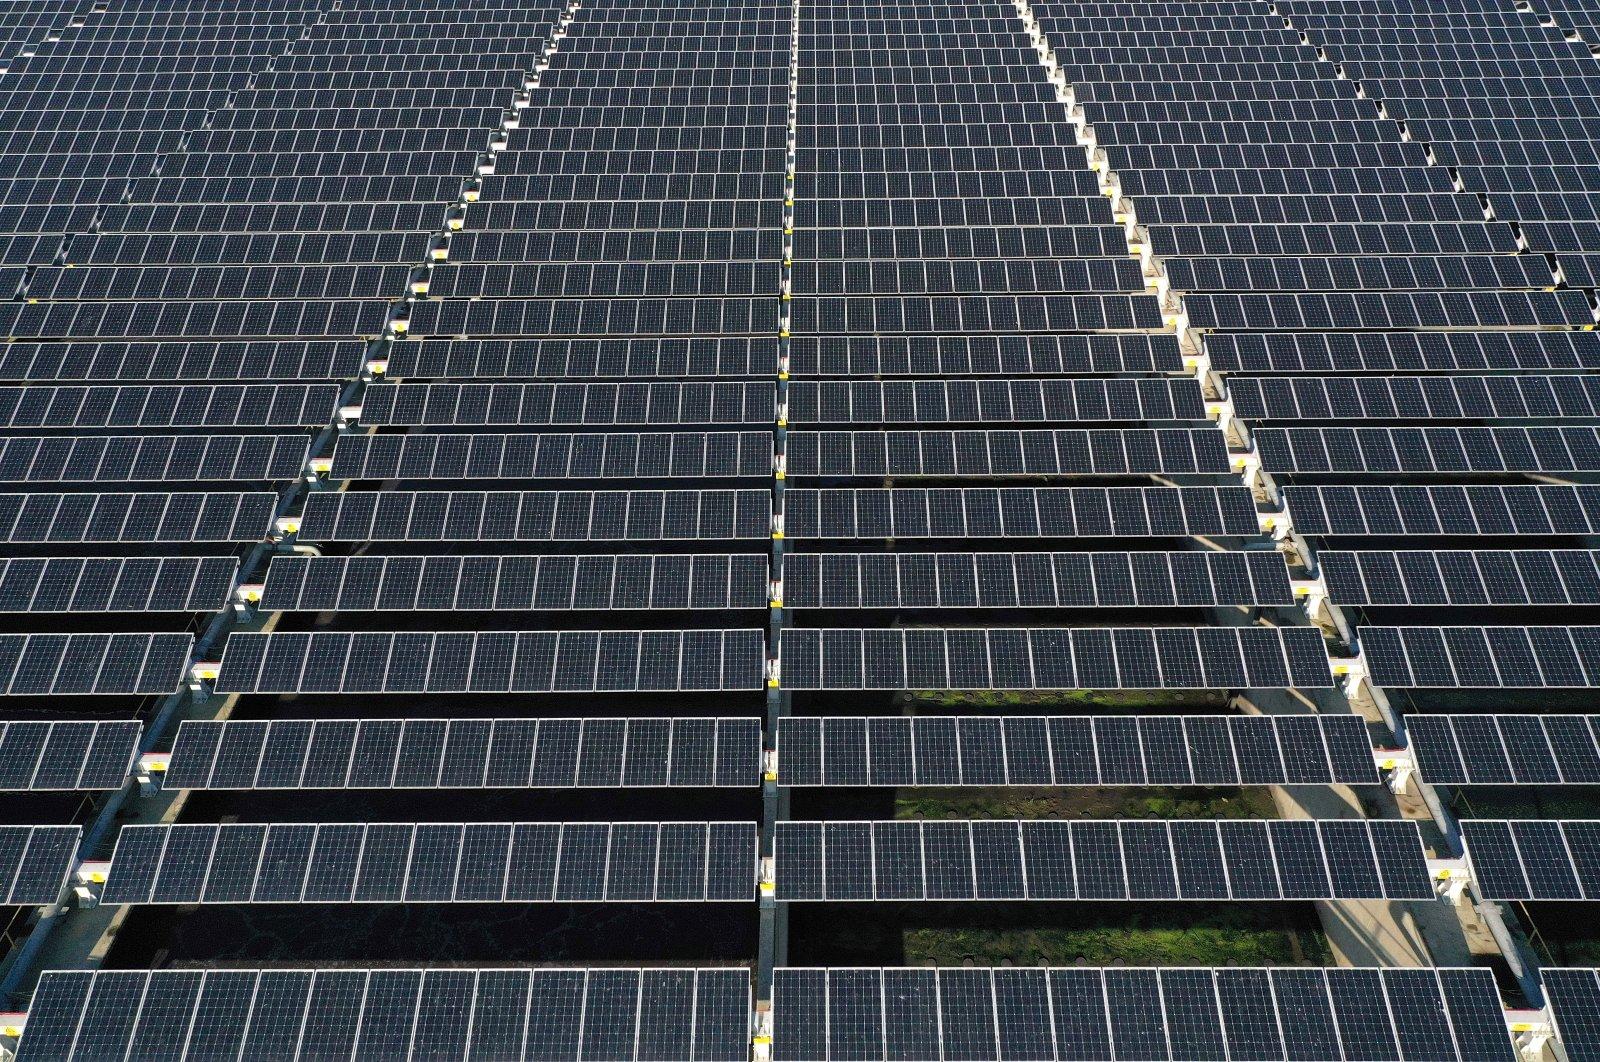 Solar panels are seen in Yalova province, northwestern Turkey, Nov. 19, 2020. (AA Photo)